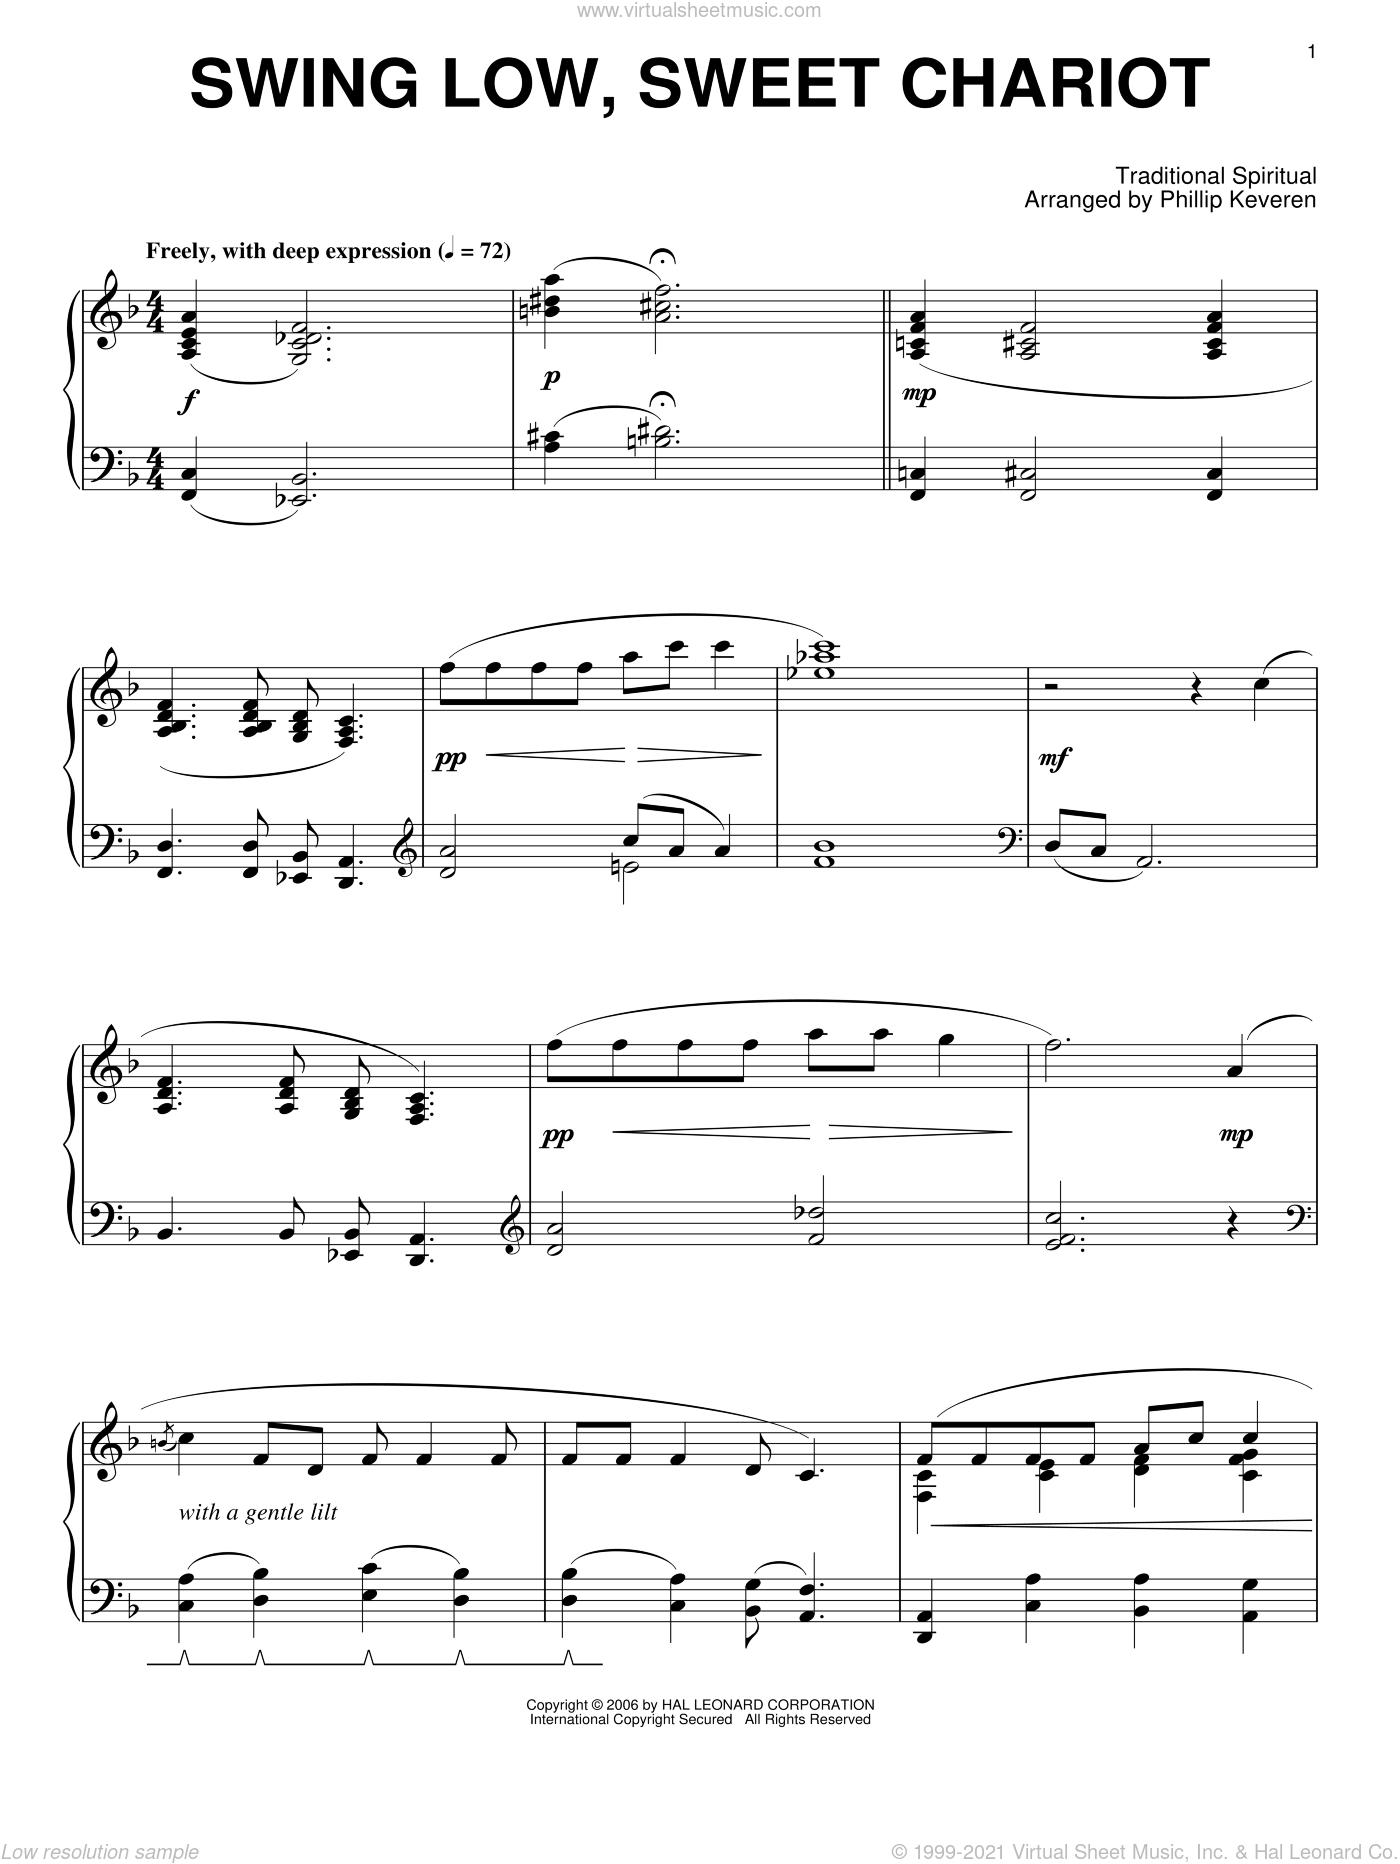 Swing Low, Sweet Chariot, (intermediate) sheet music for piano solo, intermediate skill level